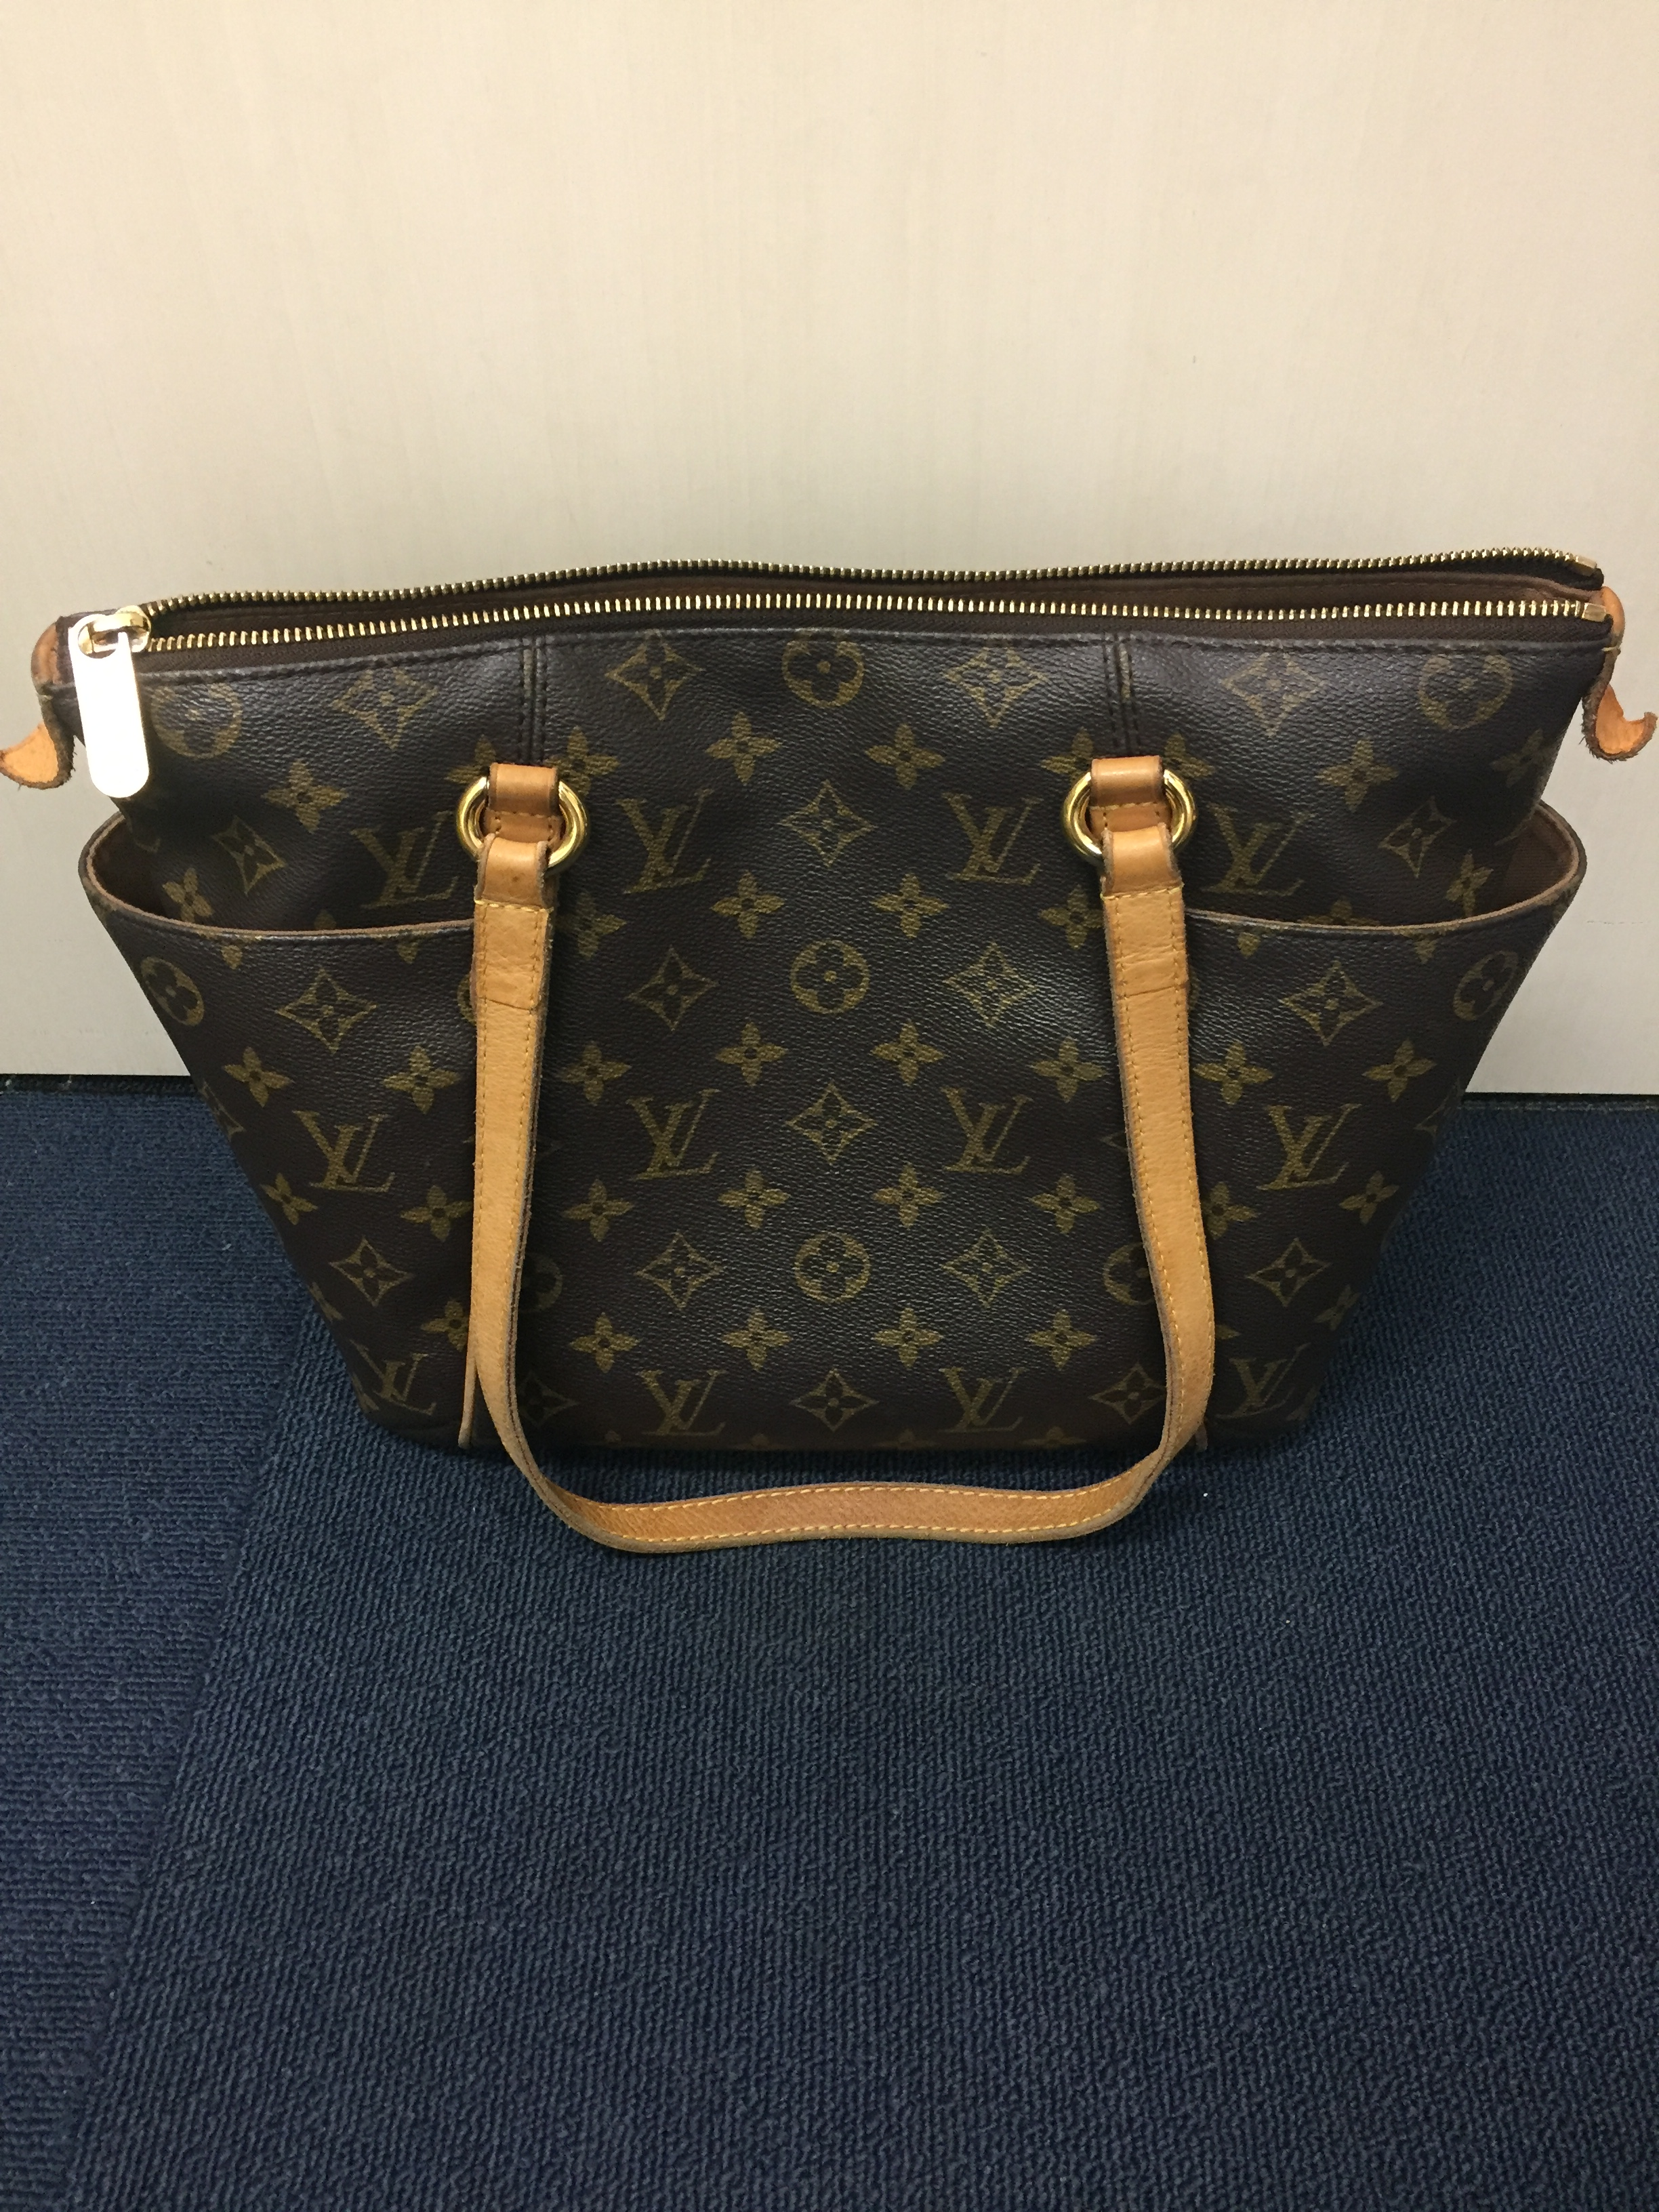 finest selection 3c7ea 938b8 LOUIS VUITTON ルイヴィトン 財布 バック 鞄 を売るなら知立市 ...